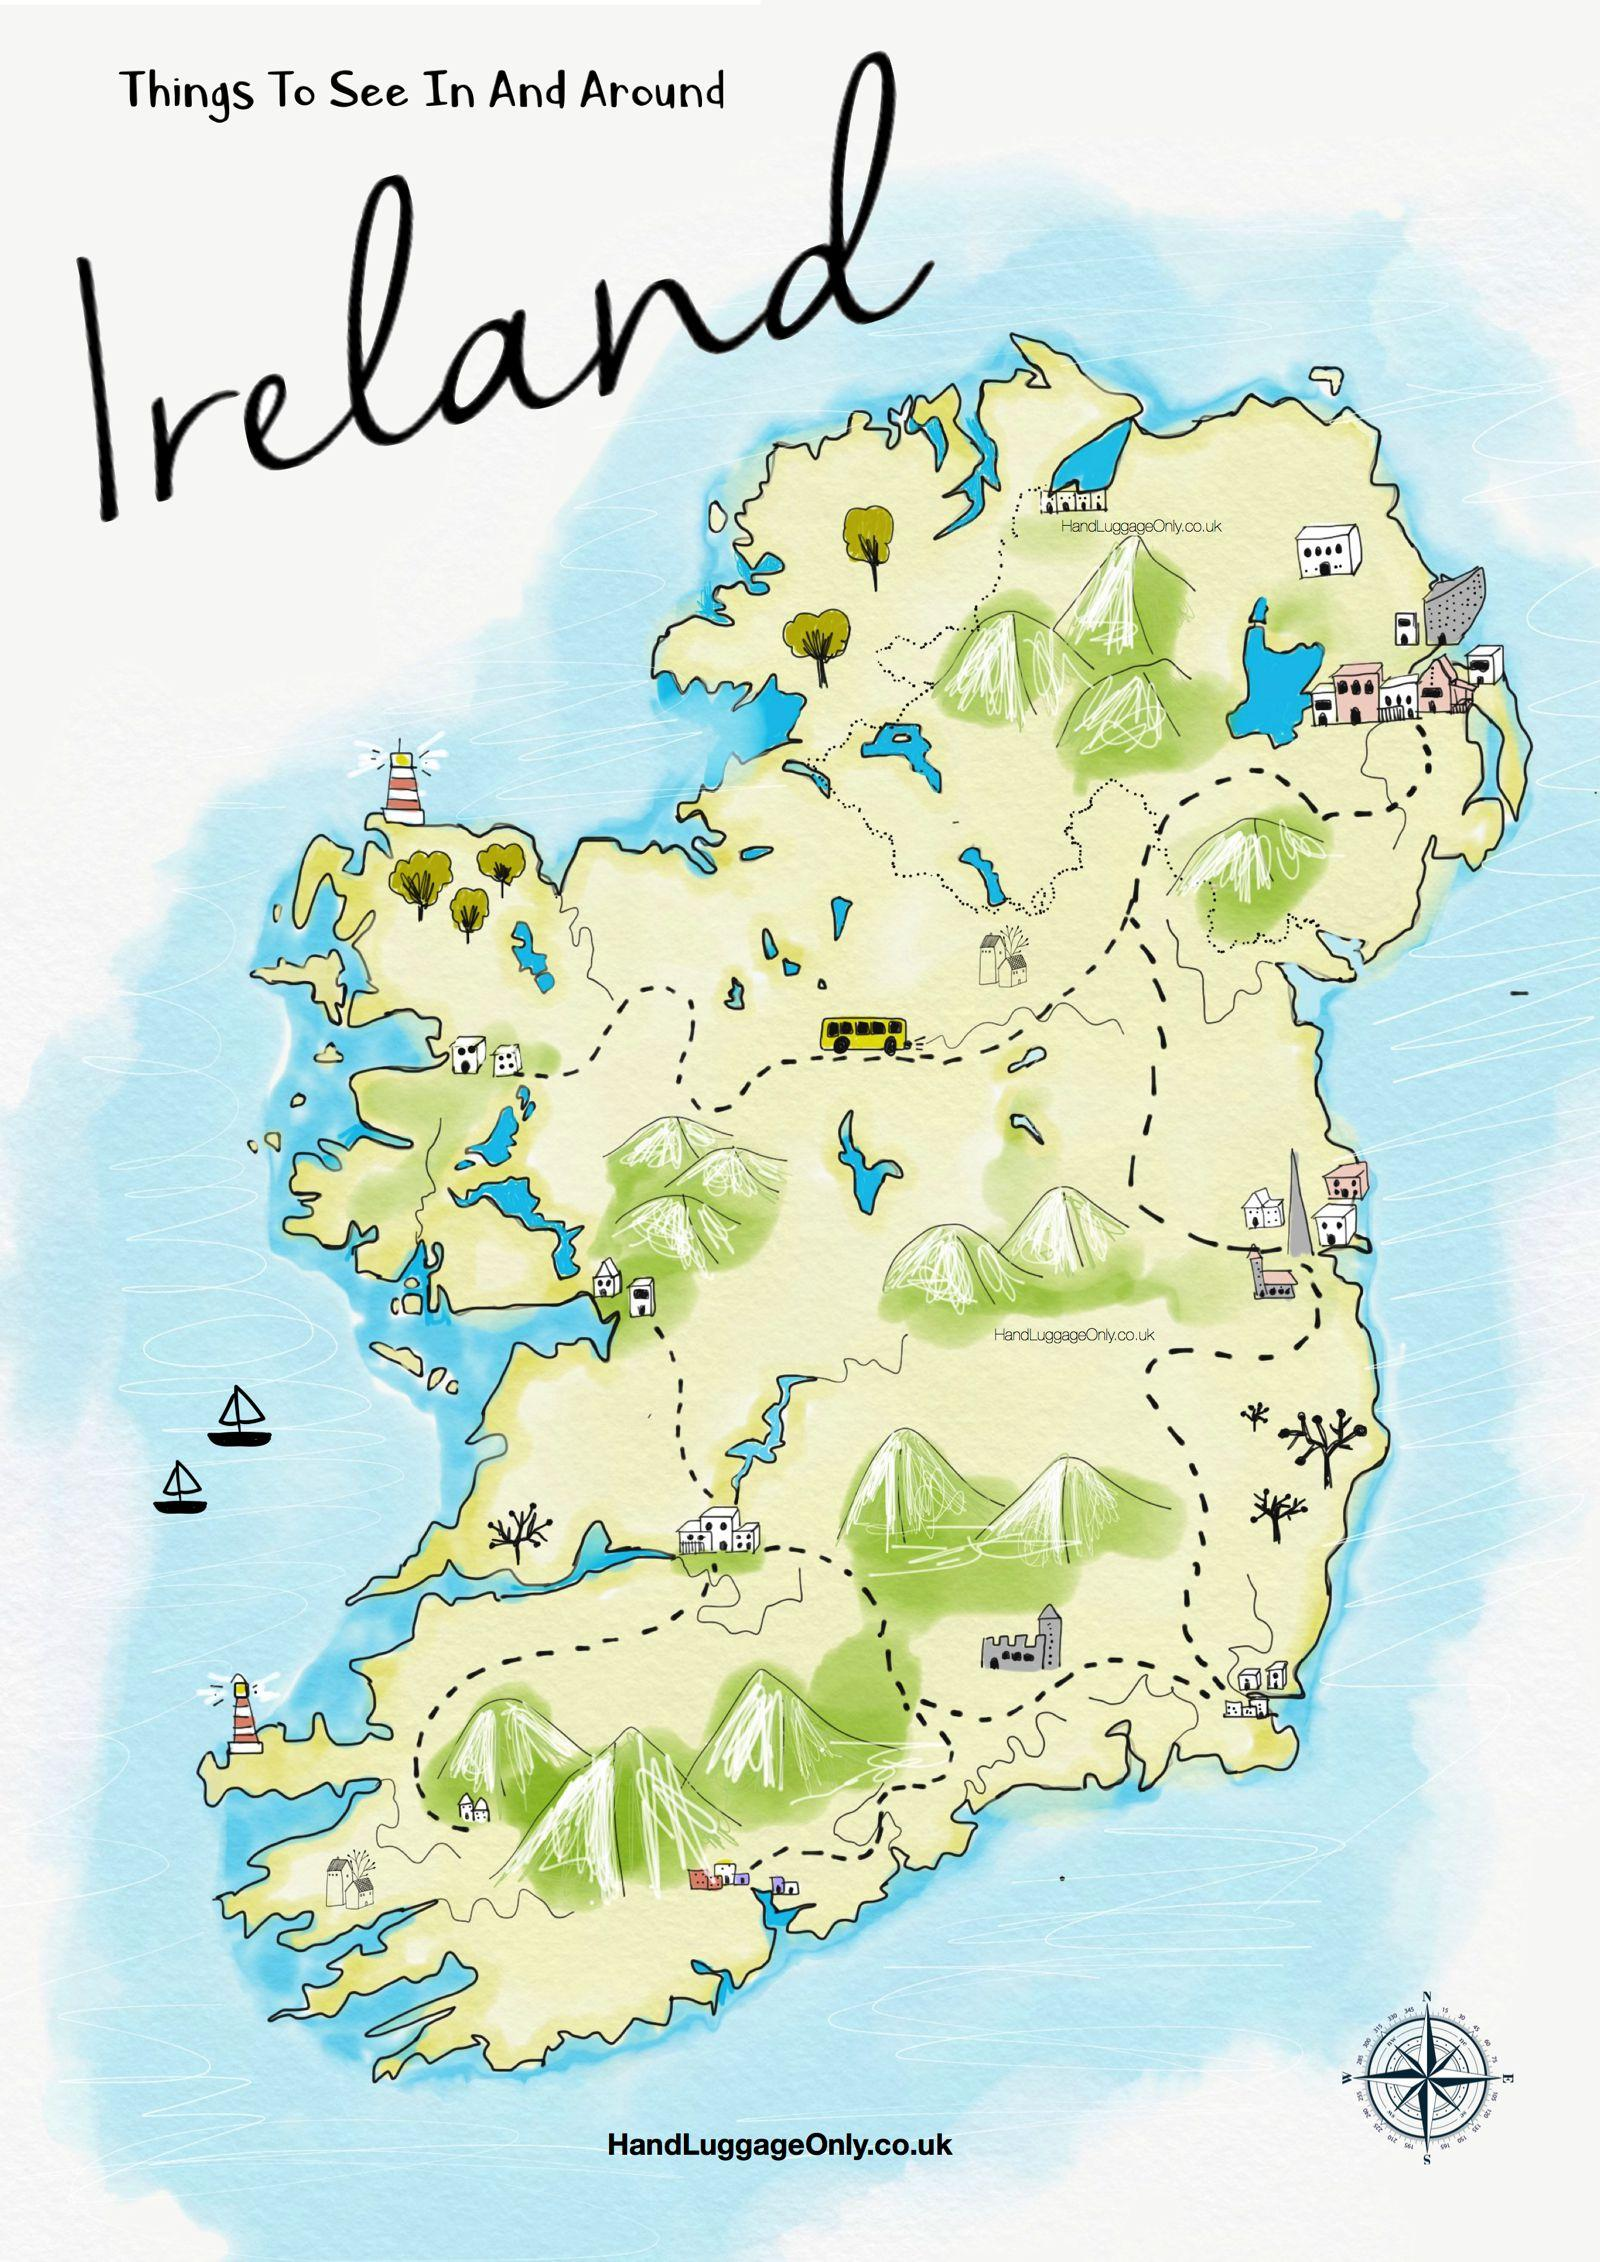 Que Faire En Irlande : faire, irlande, Carte, L'irlande,, Choses, Faire, Lieux, Visiter, Irlande, (Europe, Europe)